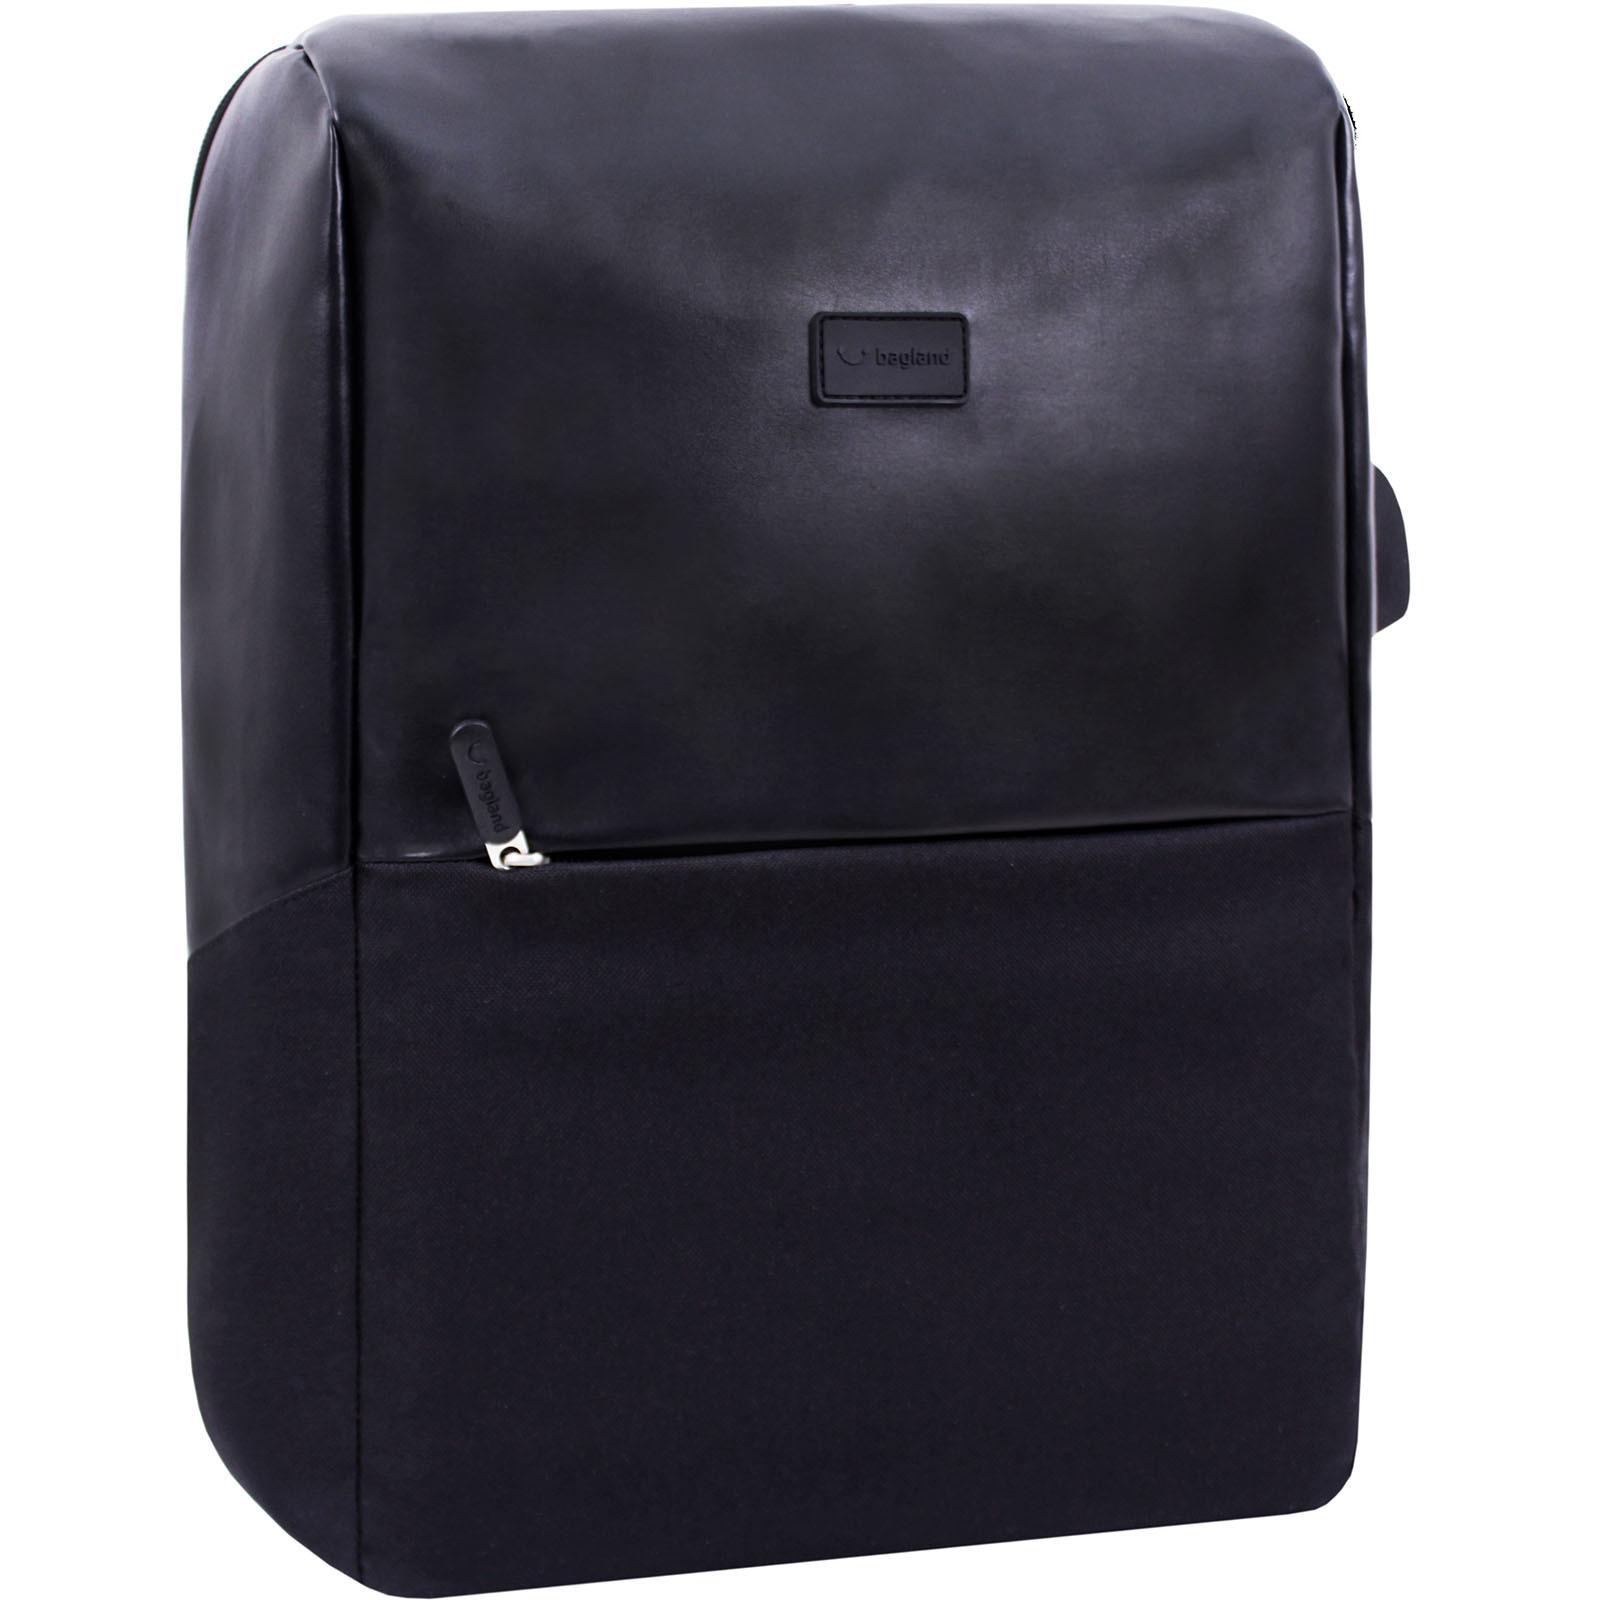 Городские рюкзаки Рюкзак Bagland Brooklyn 18 л. черный (0019466) IMG_6921.jpg